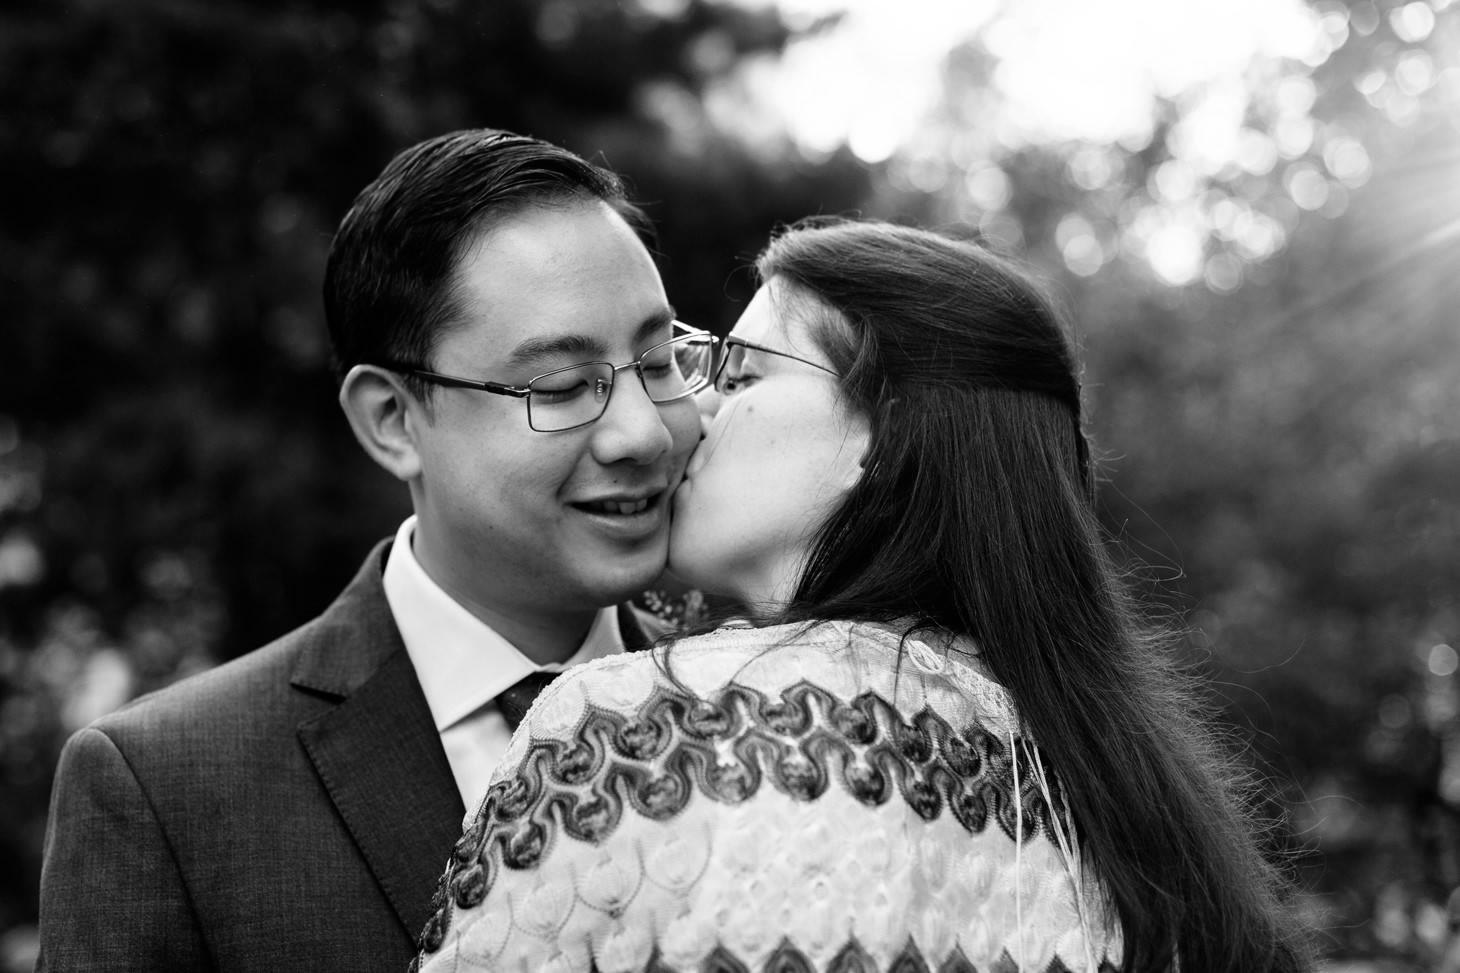 026-nyc-wedding-photographer-smitten-chickens-elope-nyc-city-hall-fall.jpg